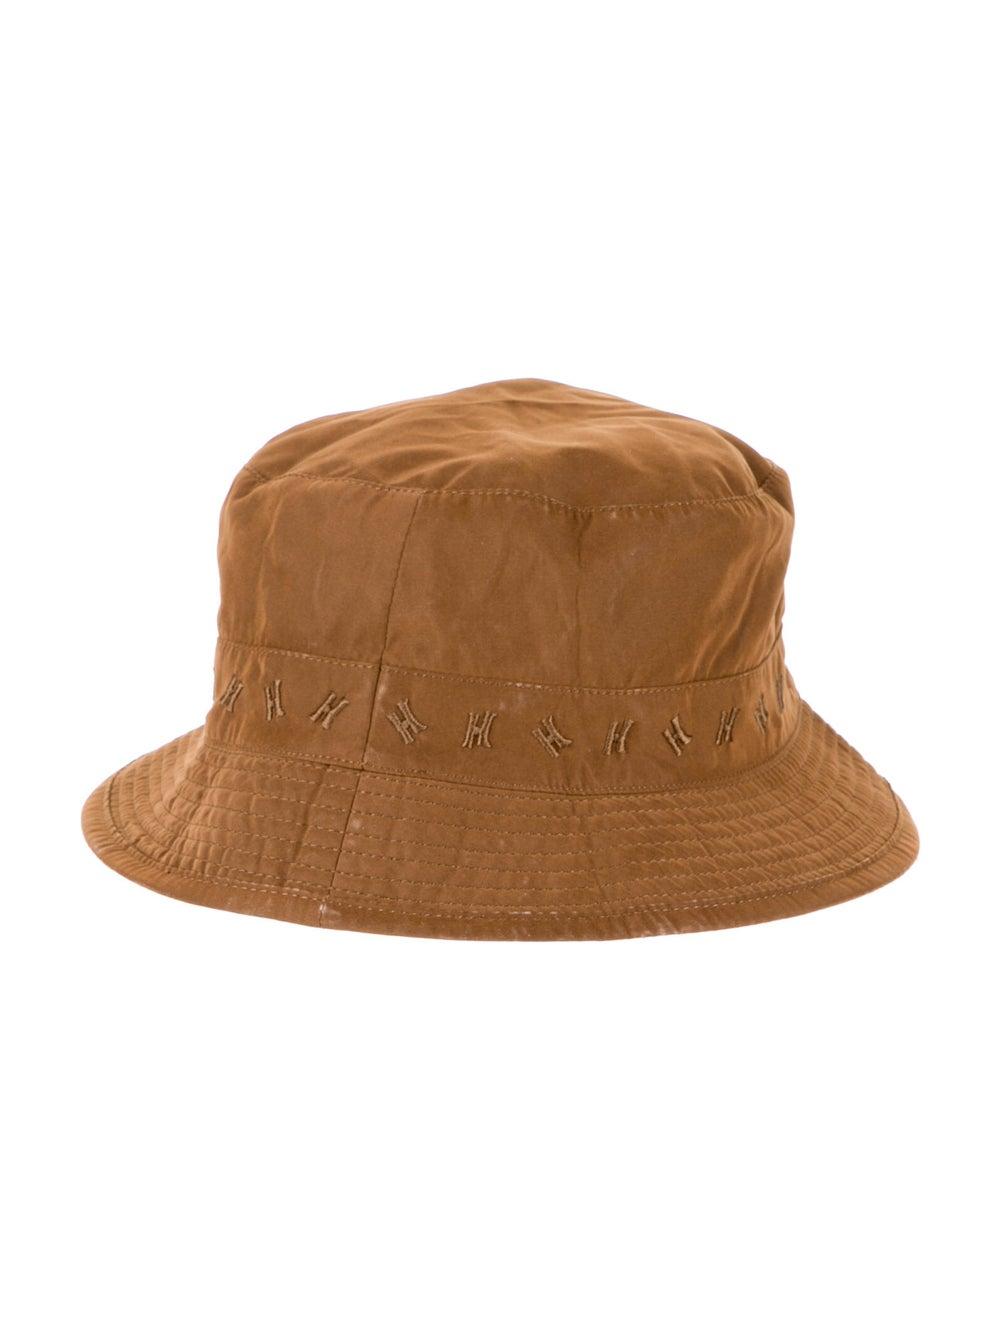 Hermès Logo Woven Bucket Hat Brown - image 2